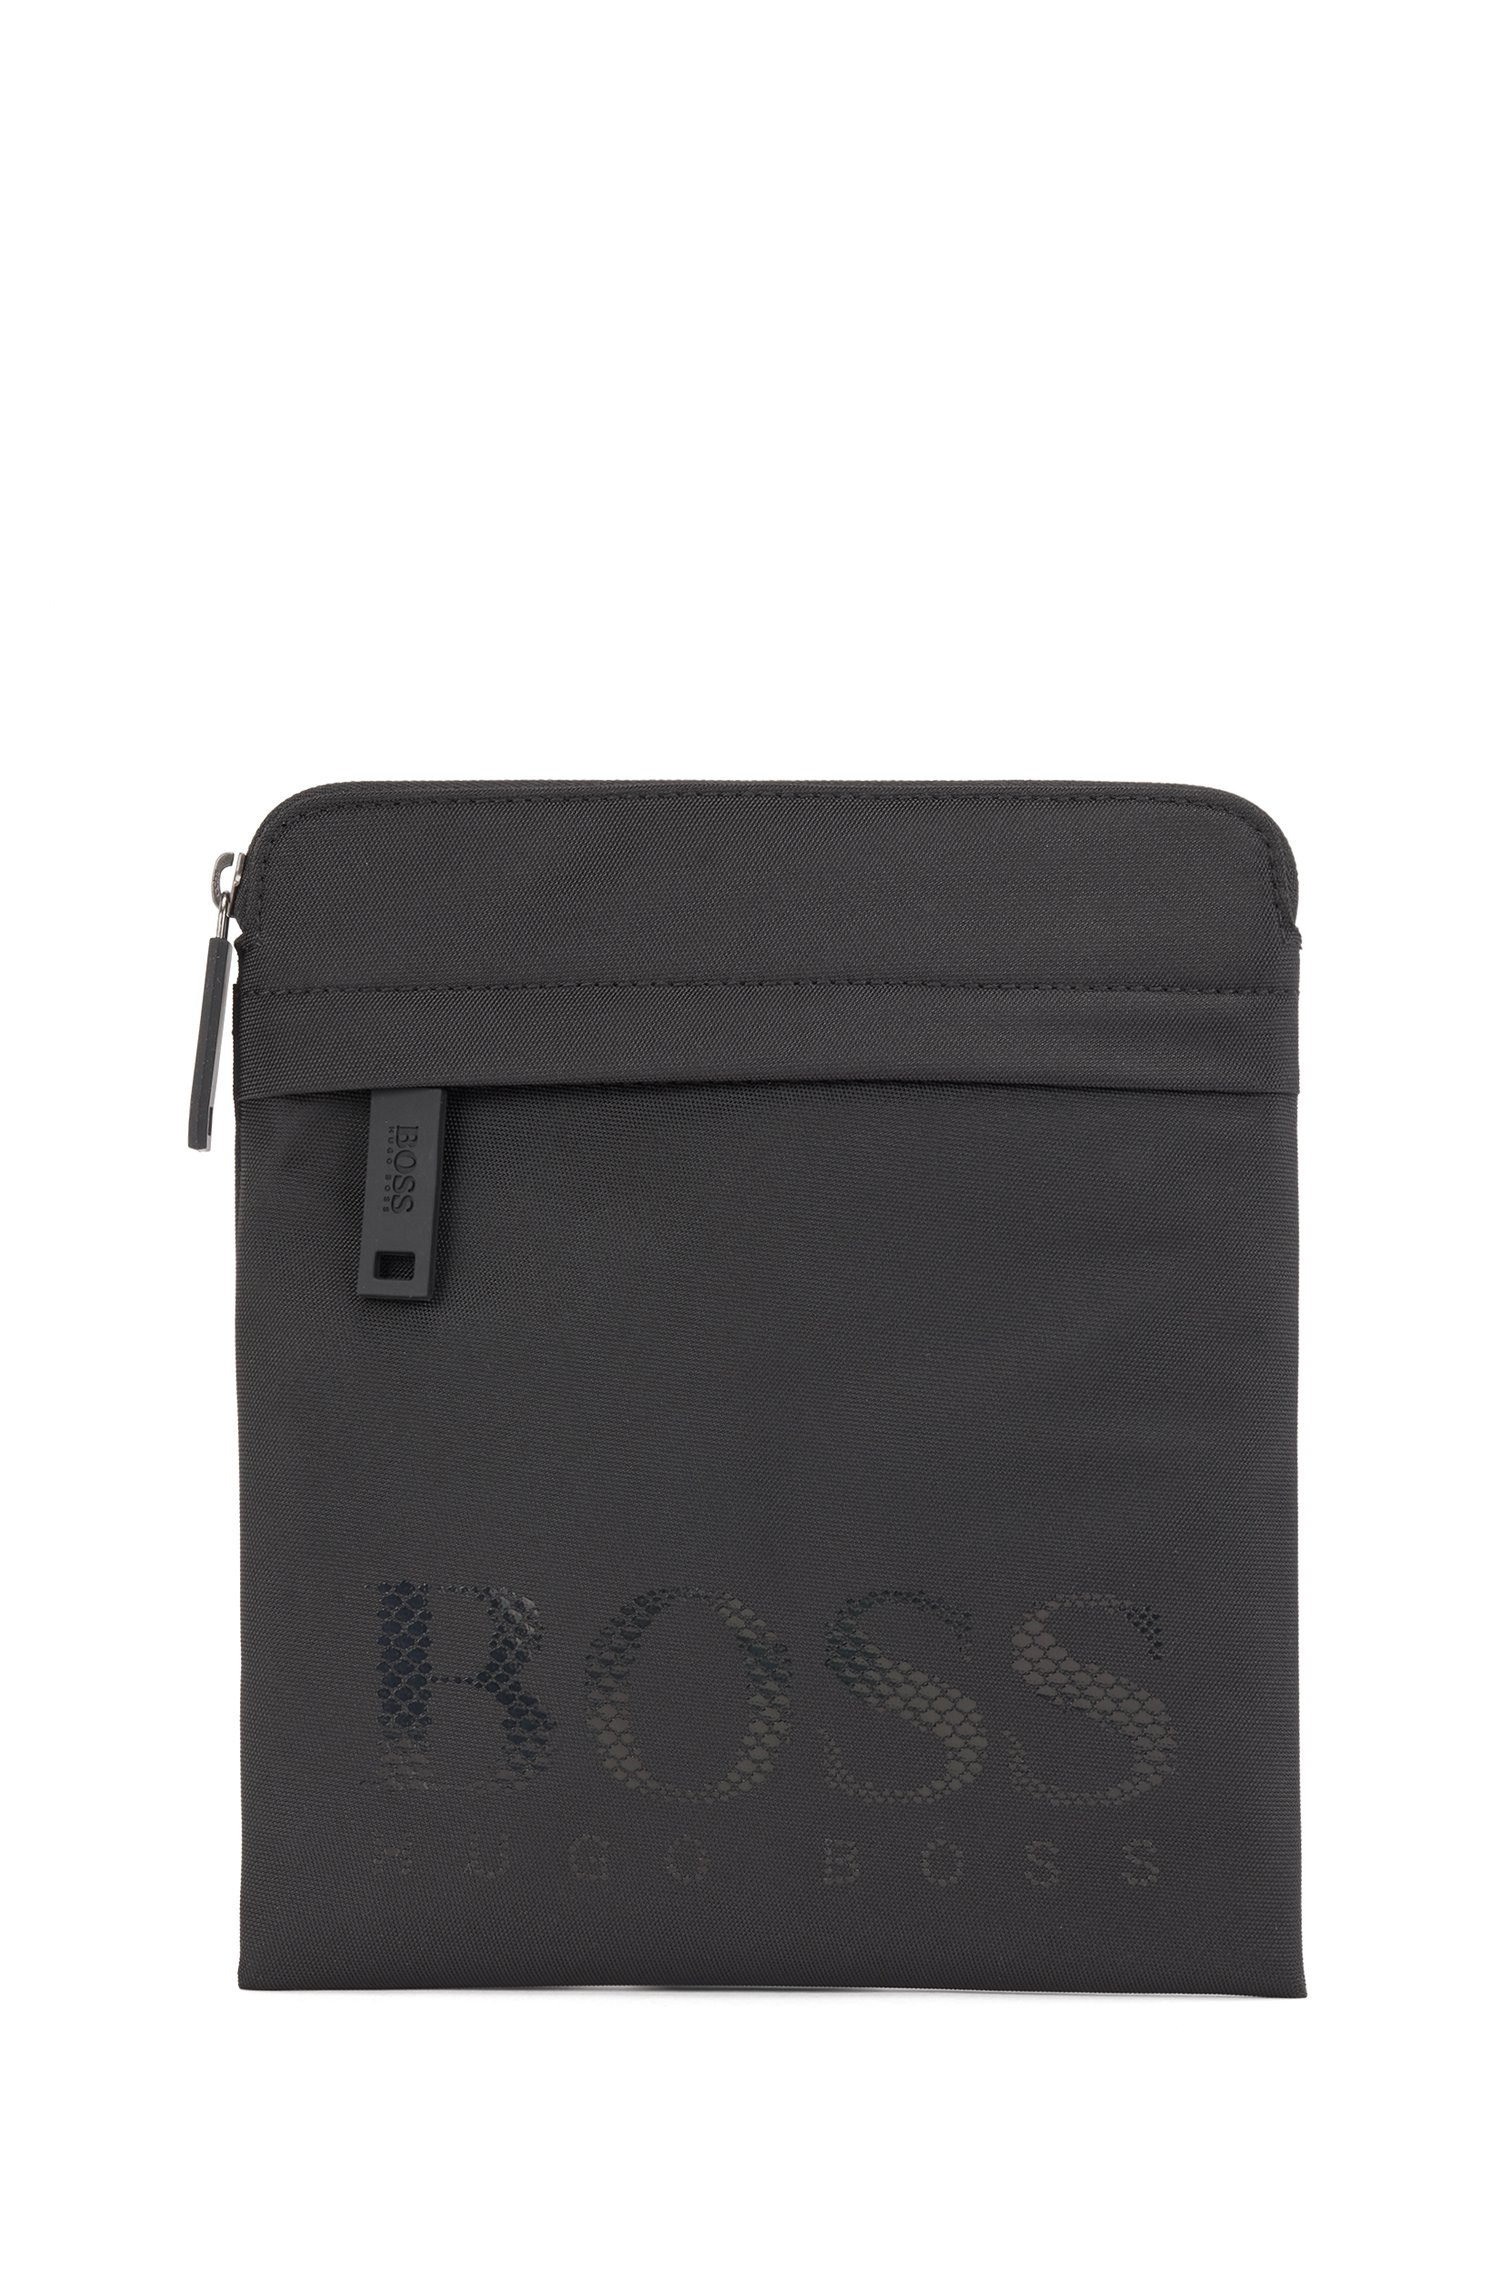 Envelope bag in structured nylon with tonal logo, Black